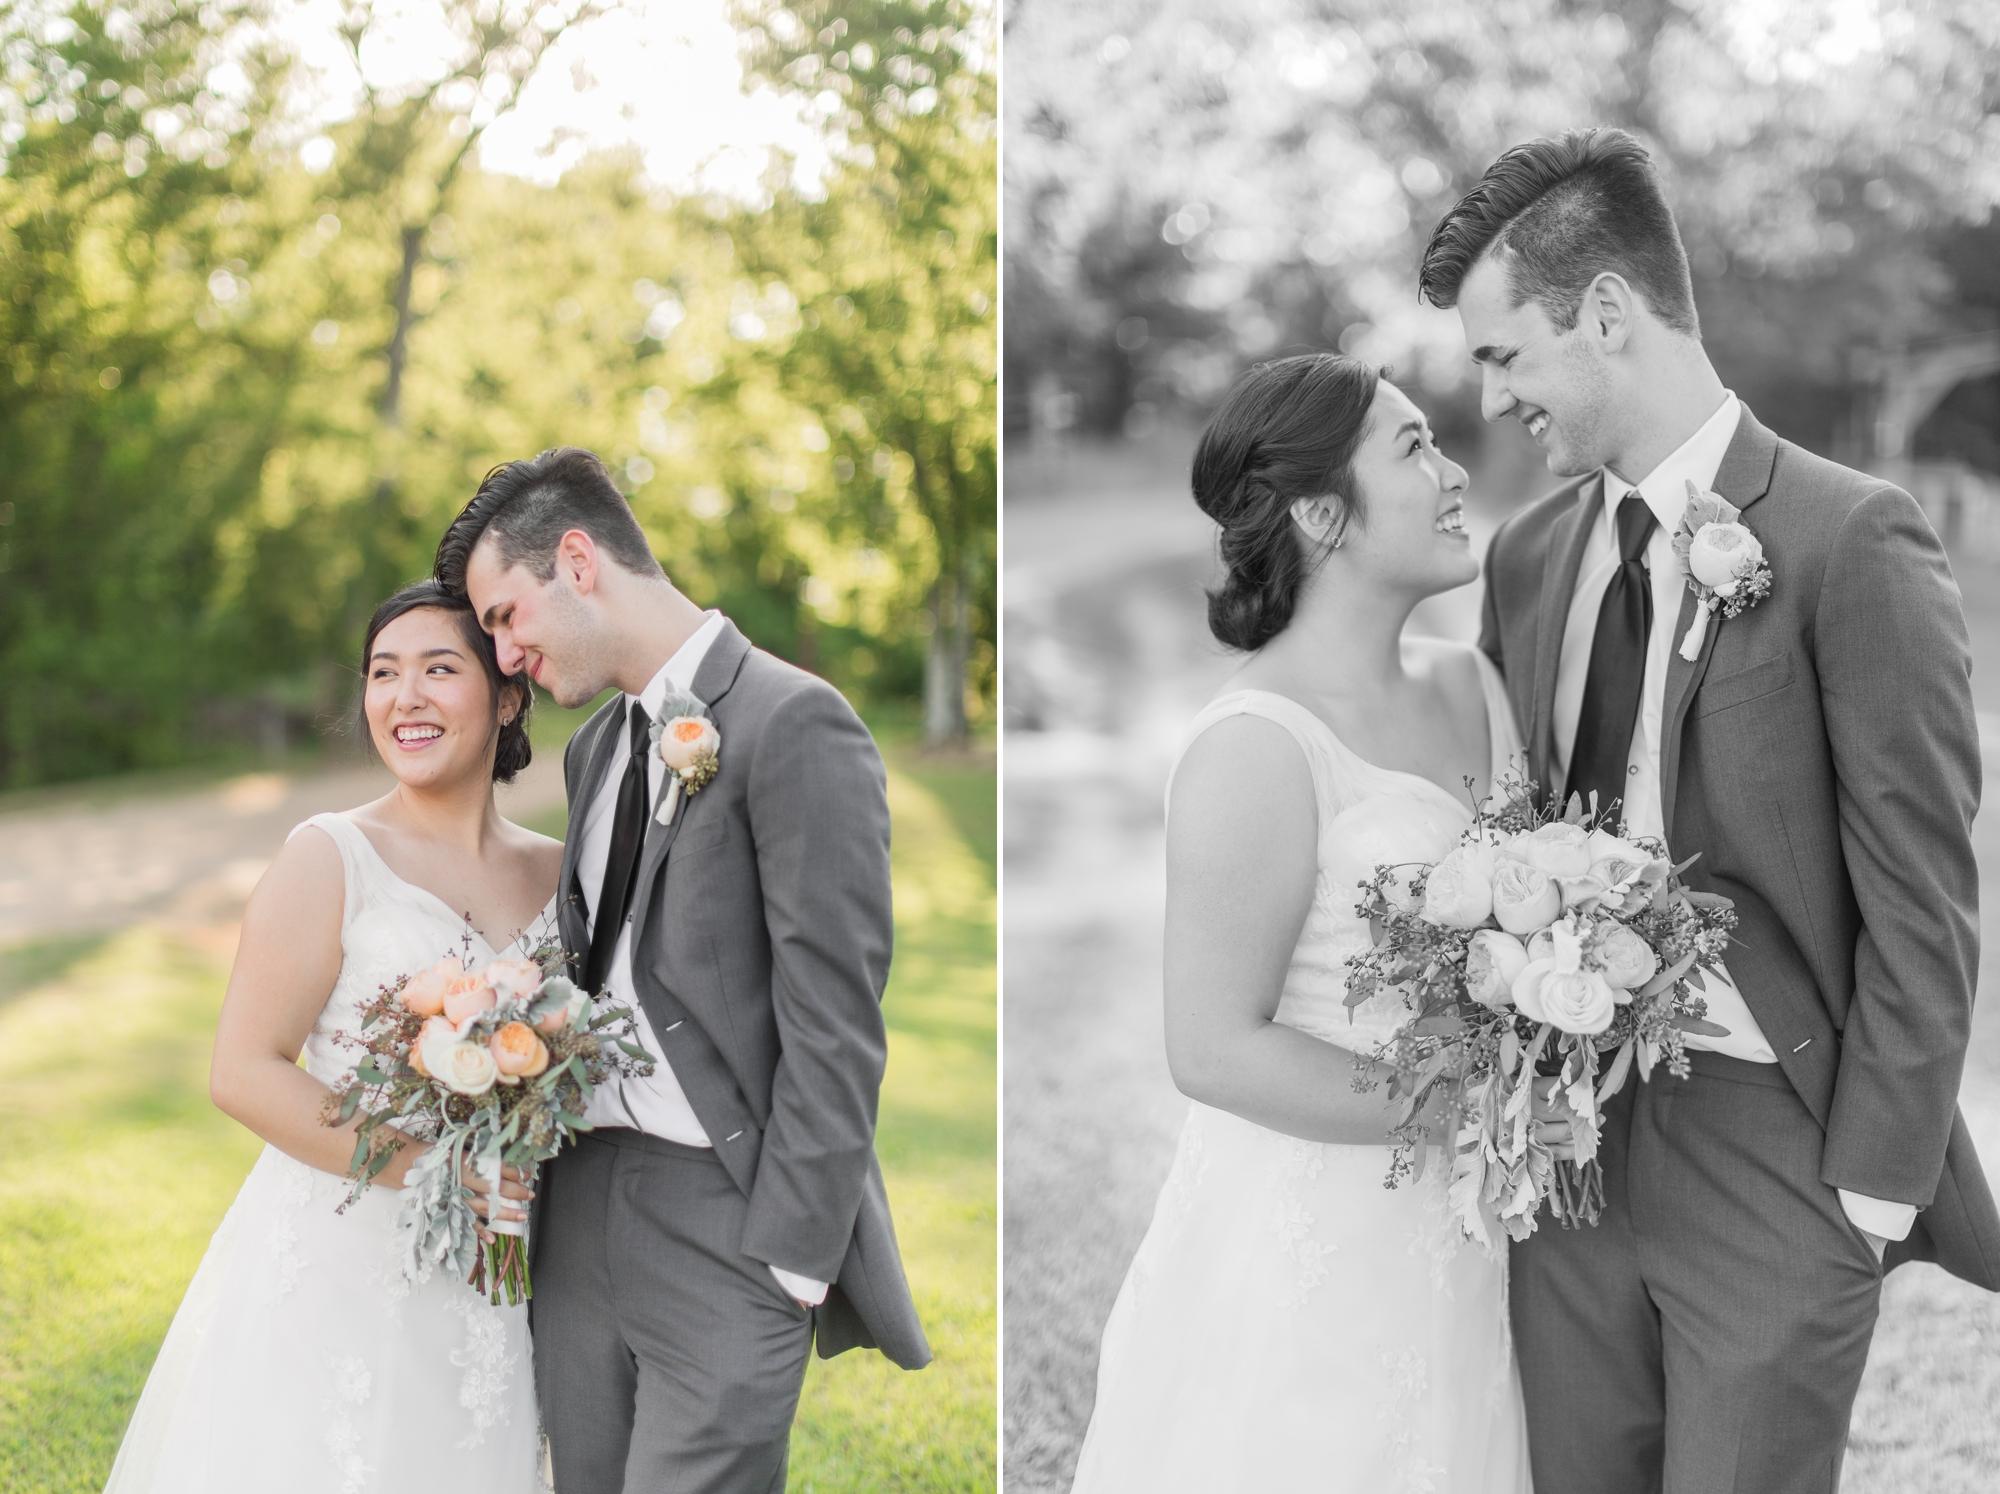 giles wedding blog 32.jpg